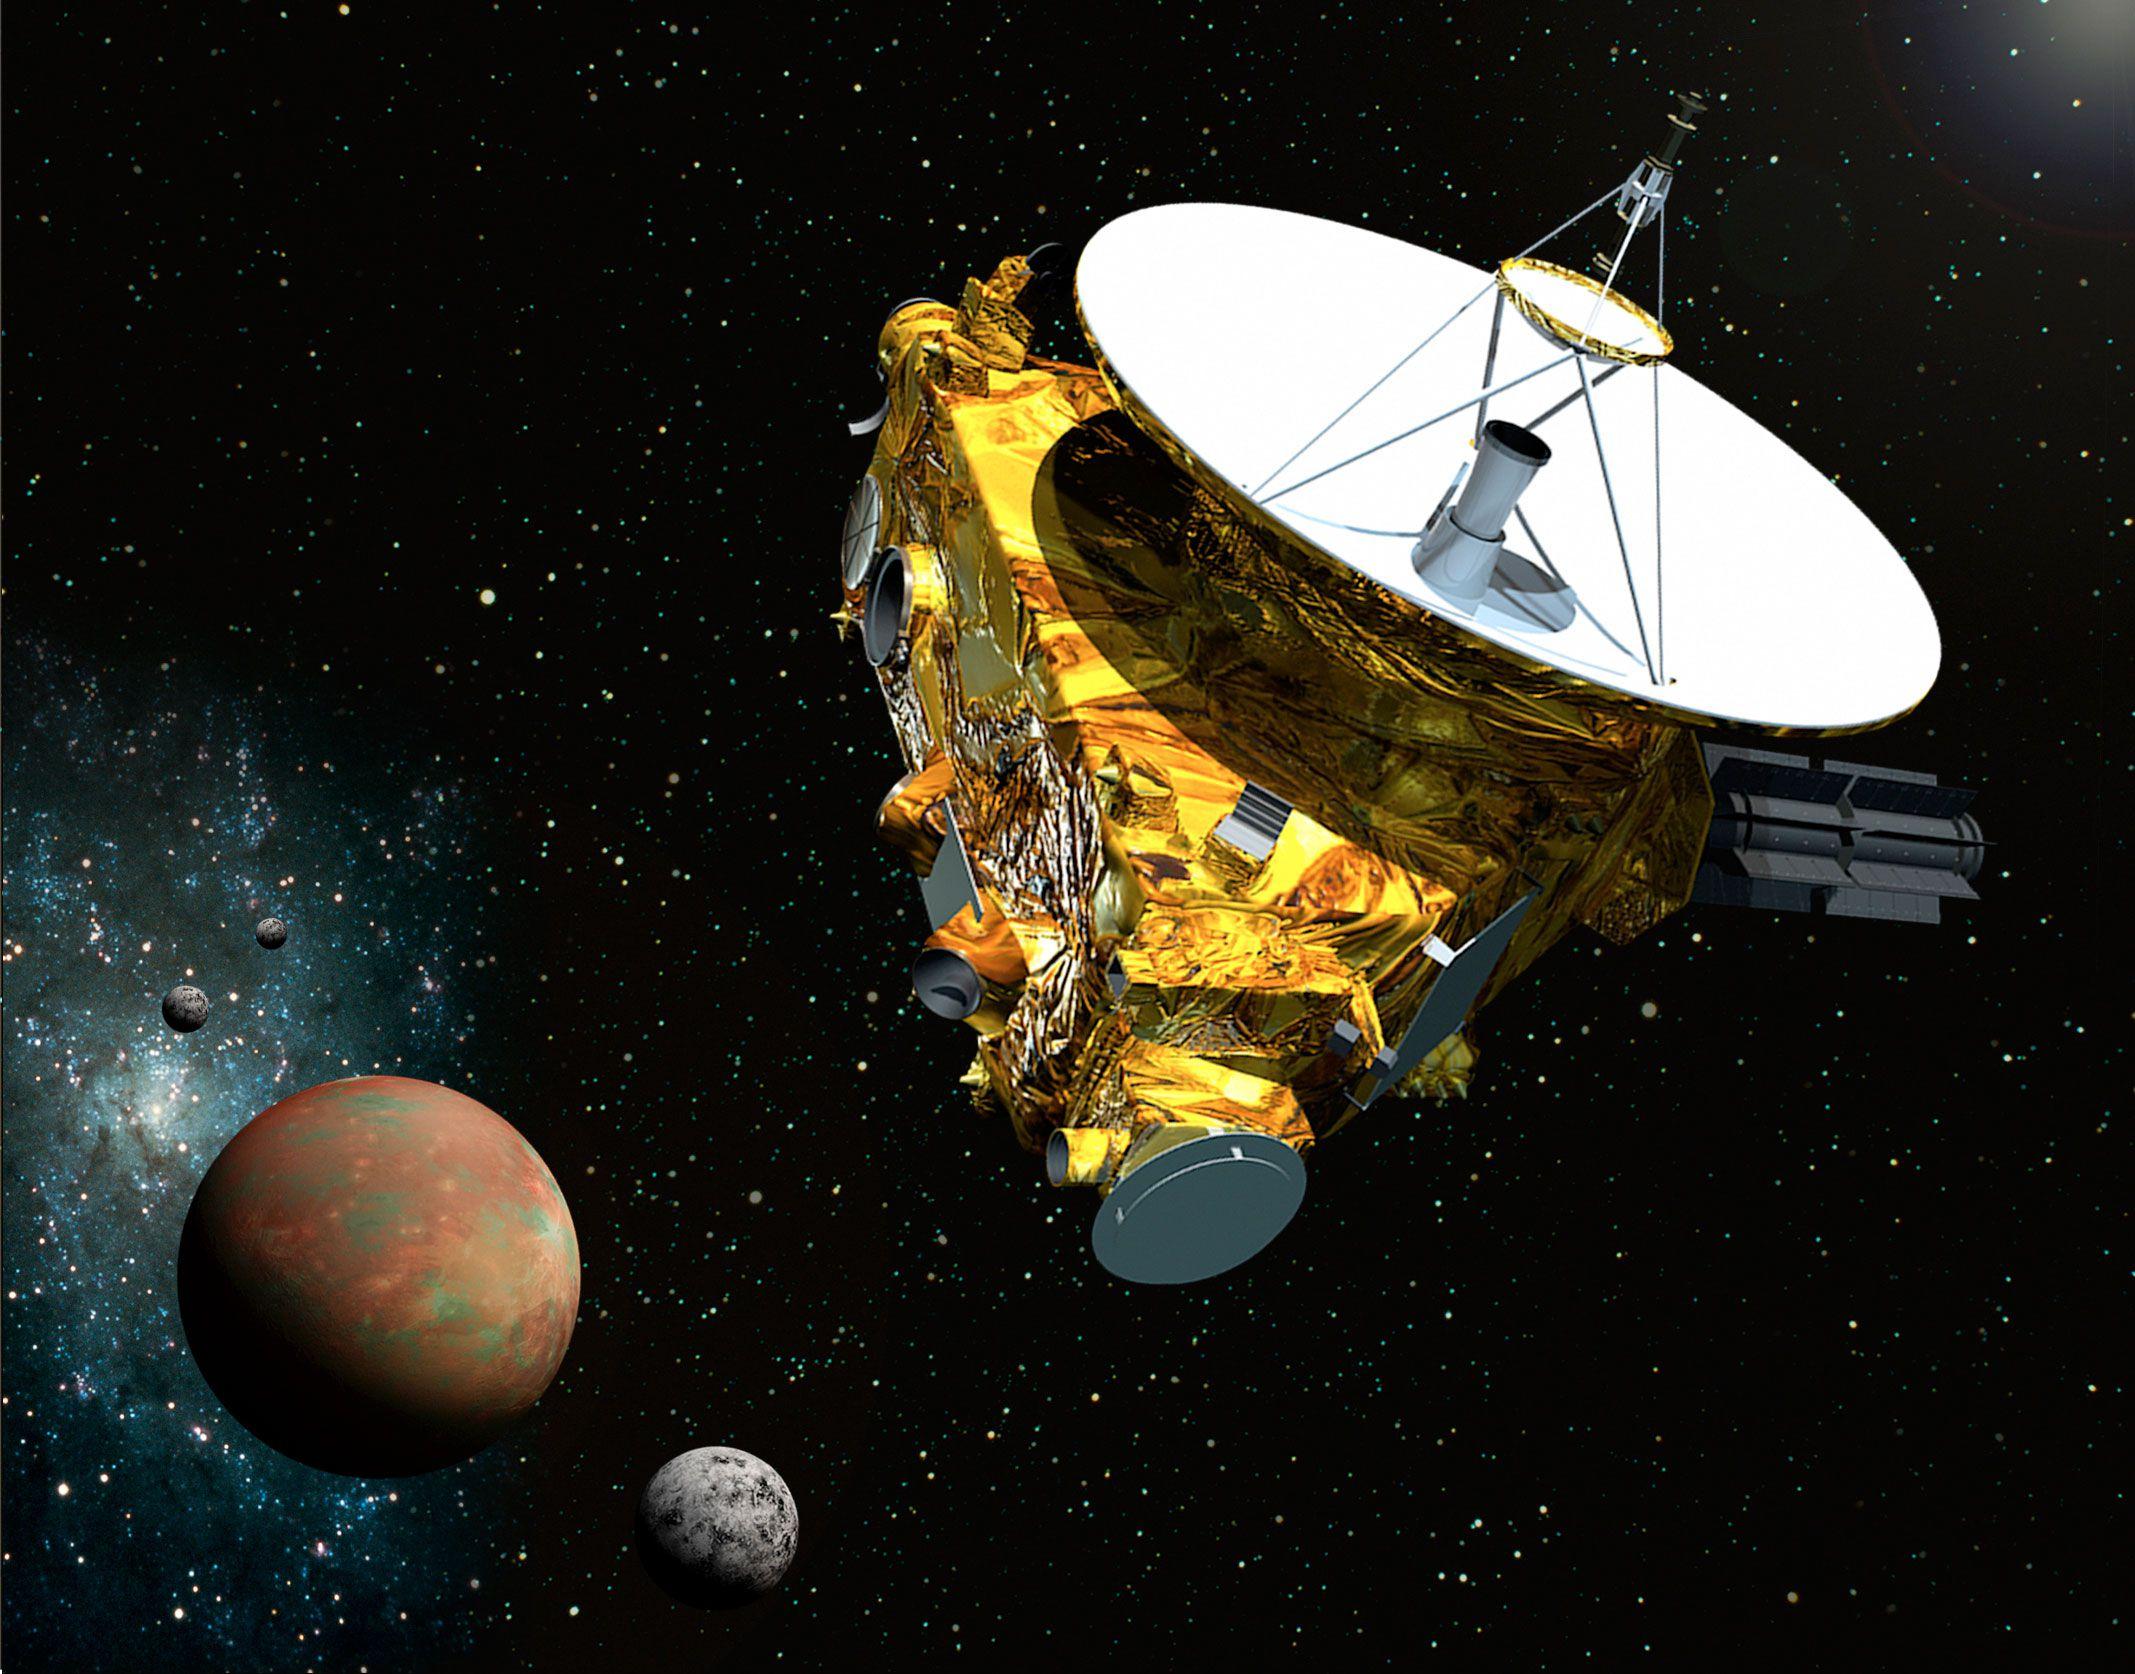 nasa probes sent to mars - photo #42